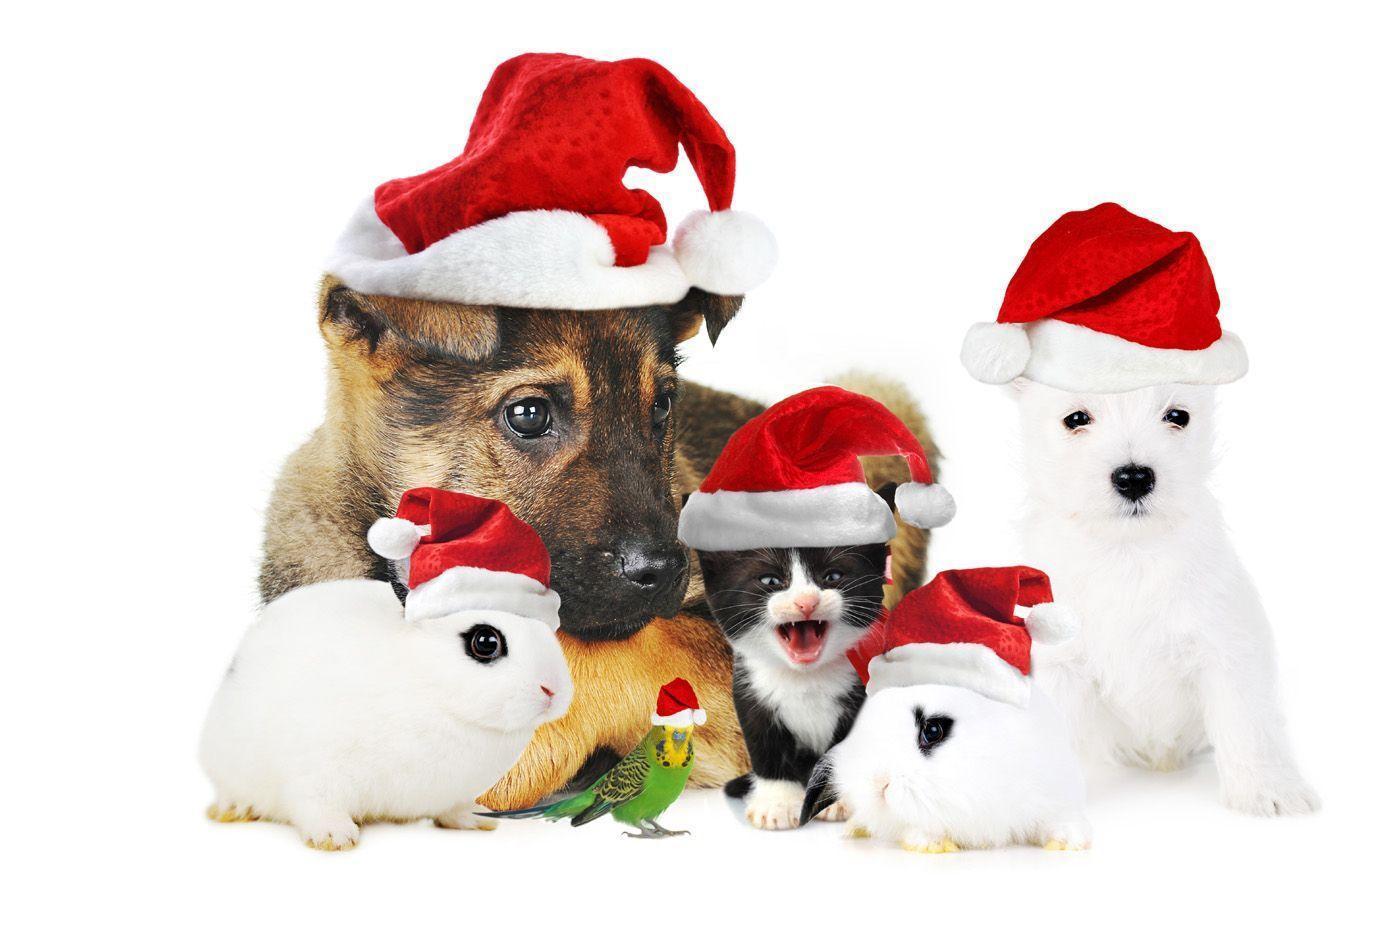 christmas puppy wallpaper - photo #37